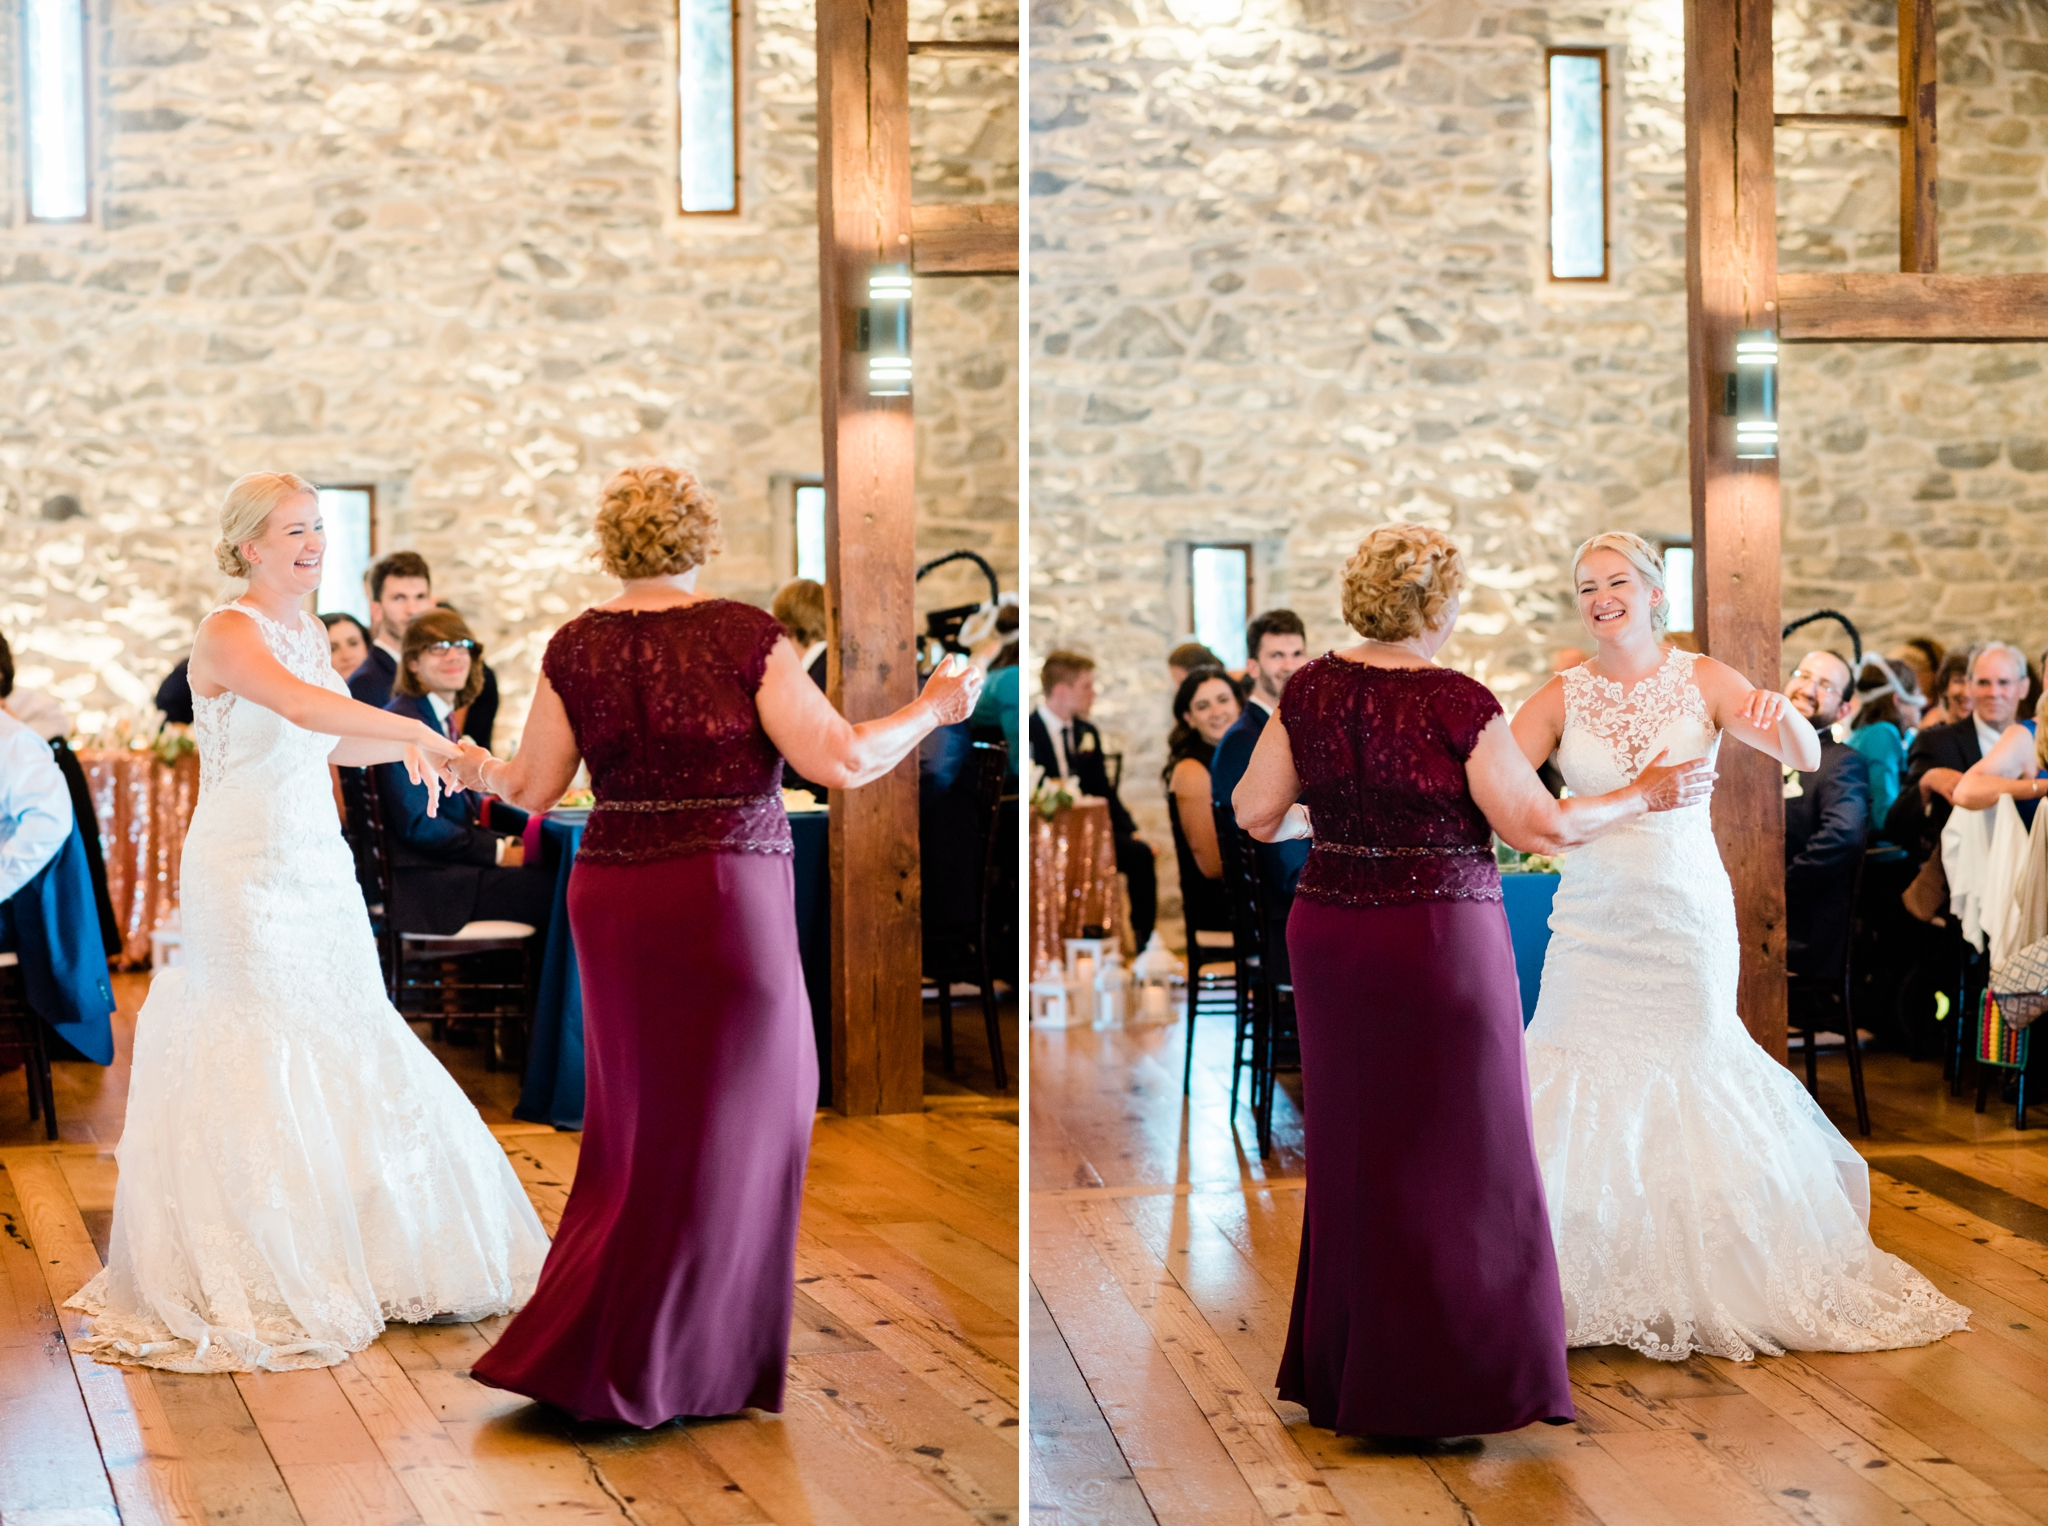 Emily Grace Photography, Lancaster PA Wedding Photographer, Wedding Photography for Unique Couples, The Barn at Silverstone, Lancaster PA Wedding Venue, The Barn at Silverstone Reception Photos